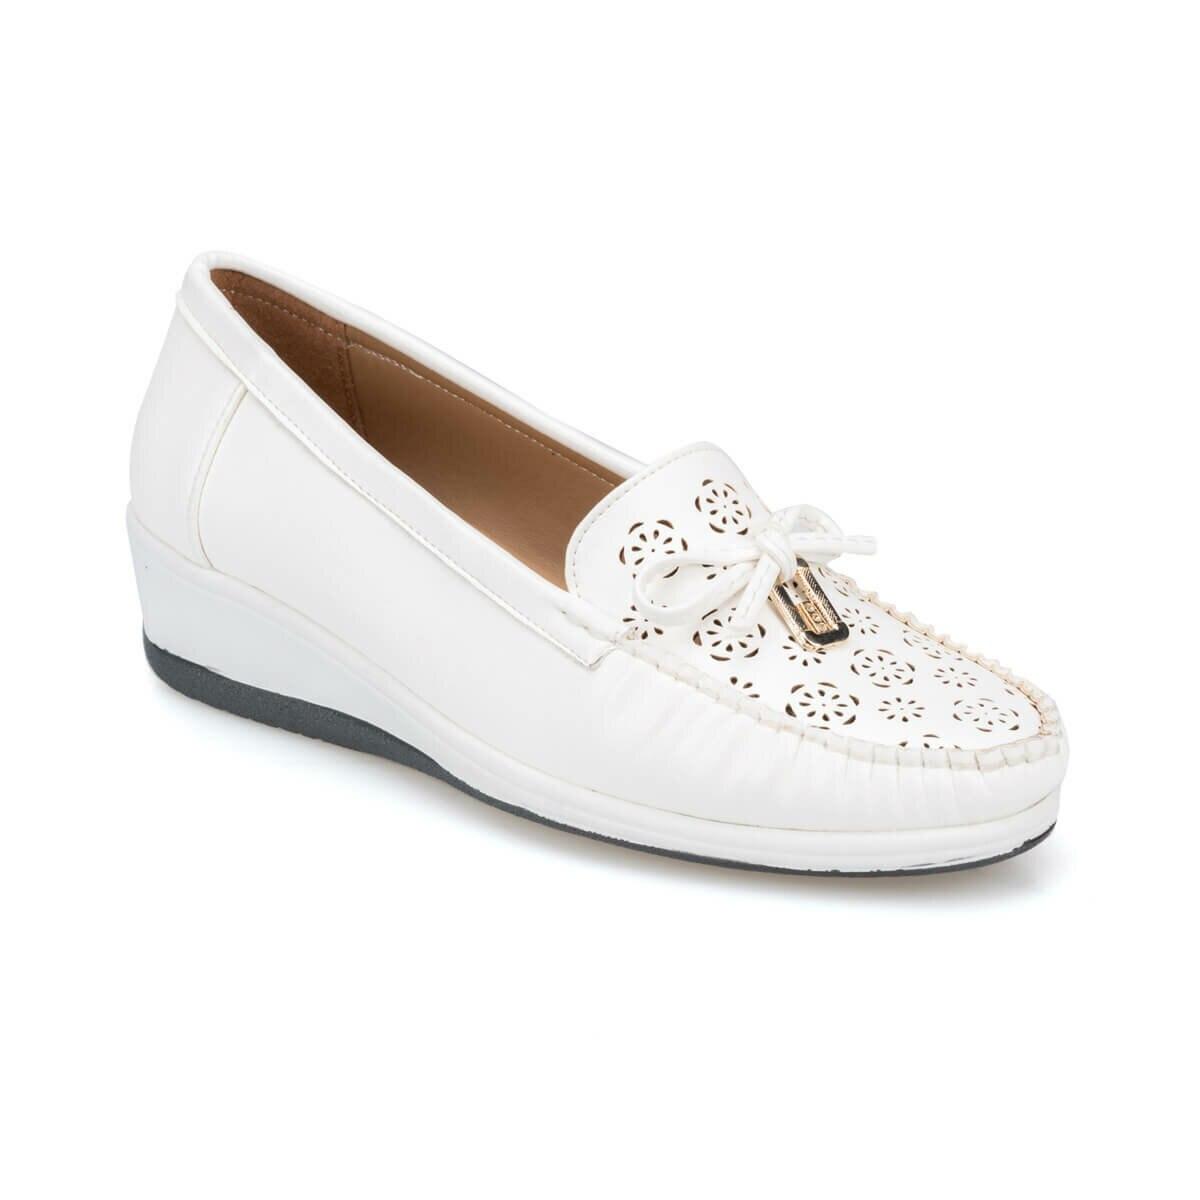 FLO Women's Sneakers Platform White Women's Summer Shoes Polaris 91. 150695.Z